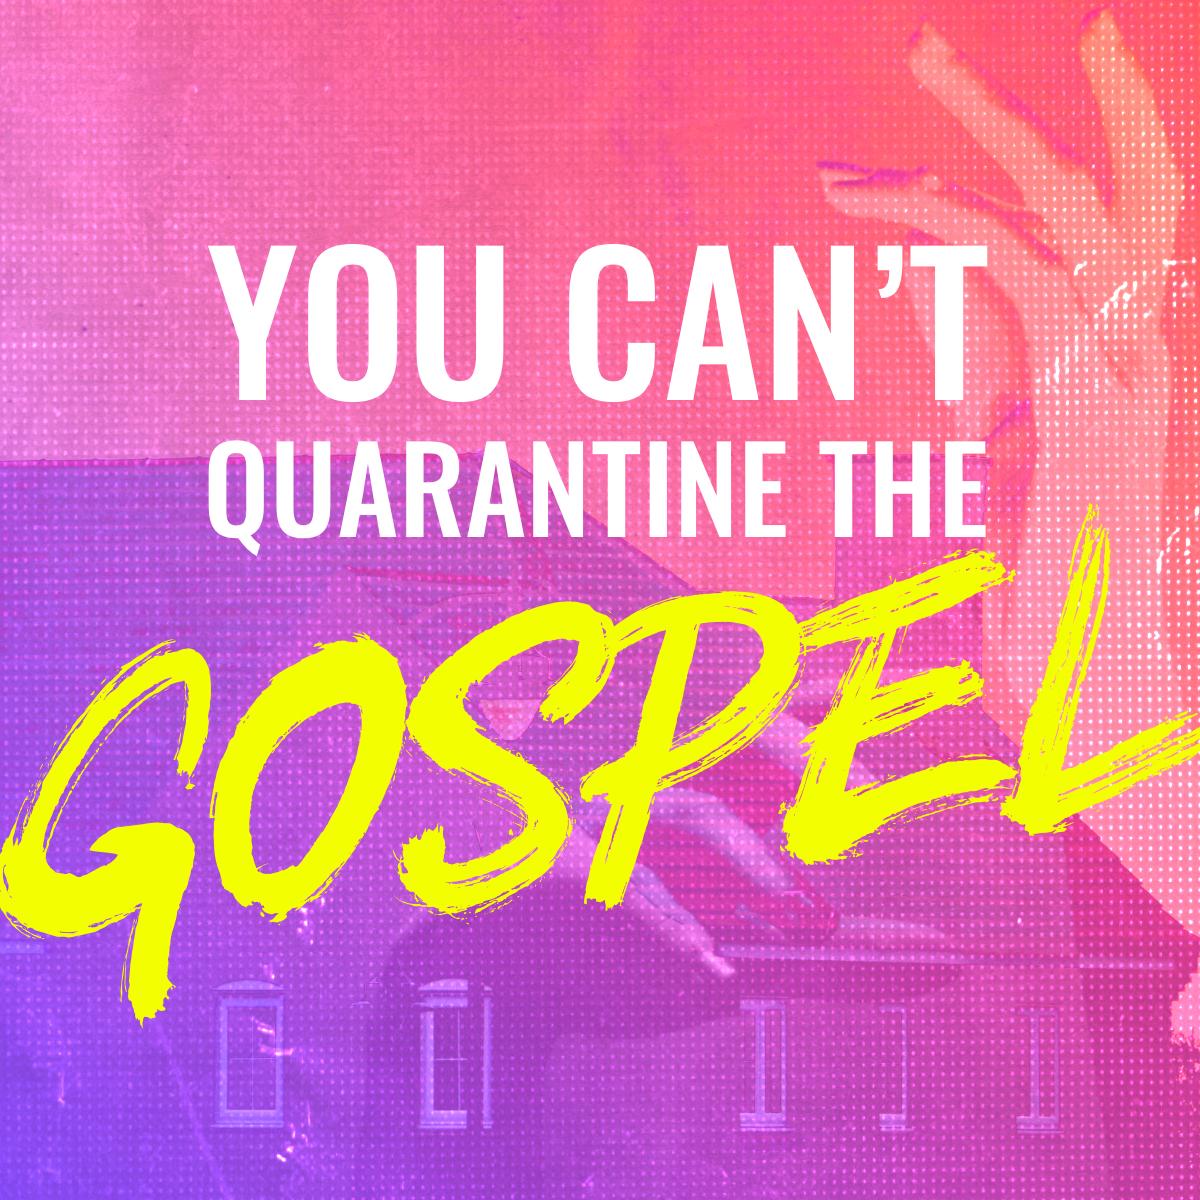 You Can't Quarantine the Gospel